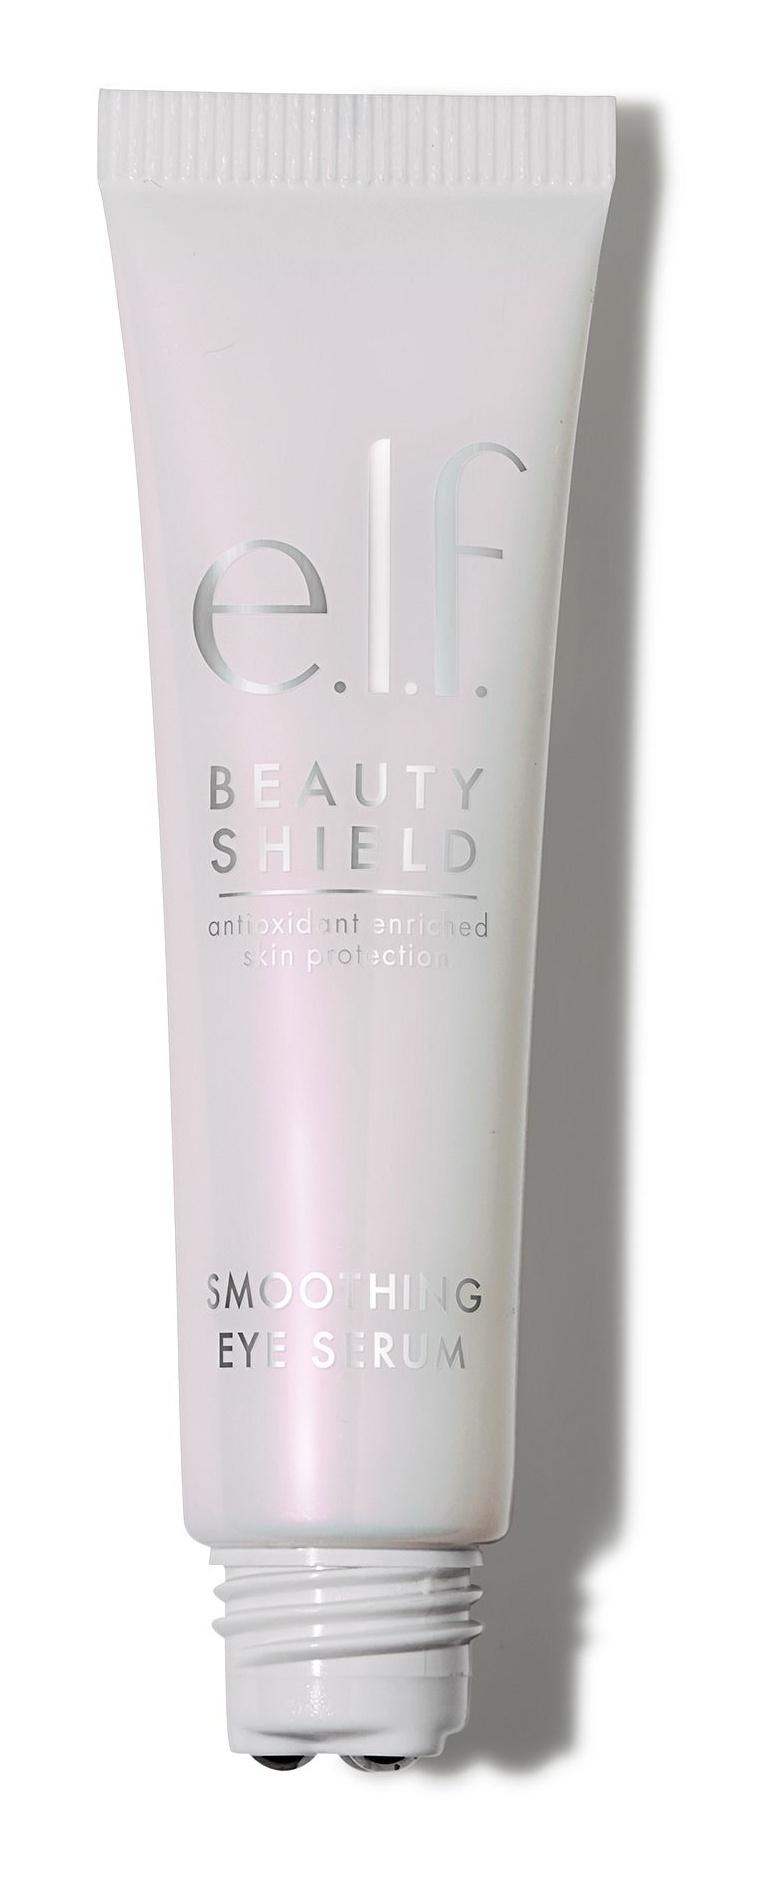 e.l.f. Beauty Shield Smoothing Eye Serum